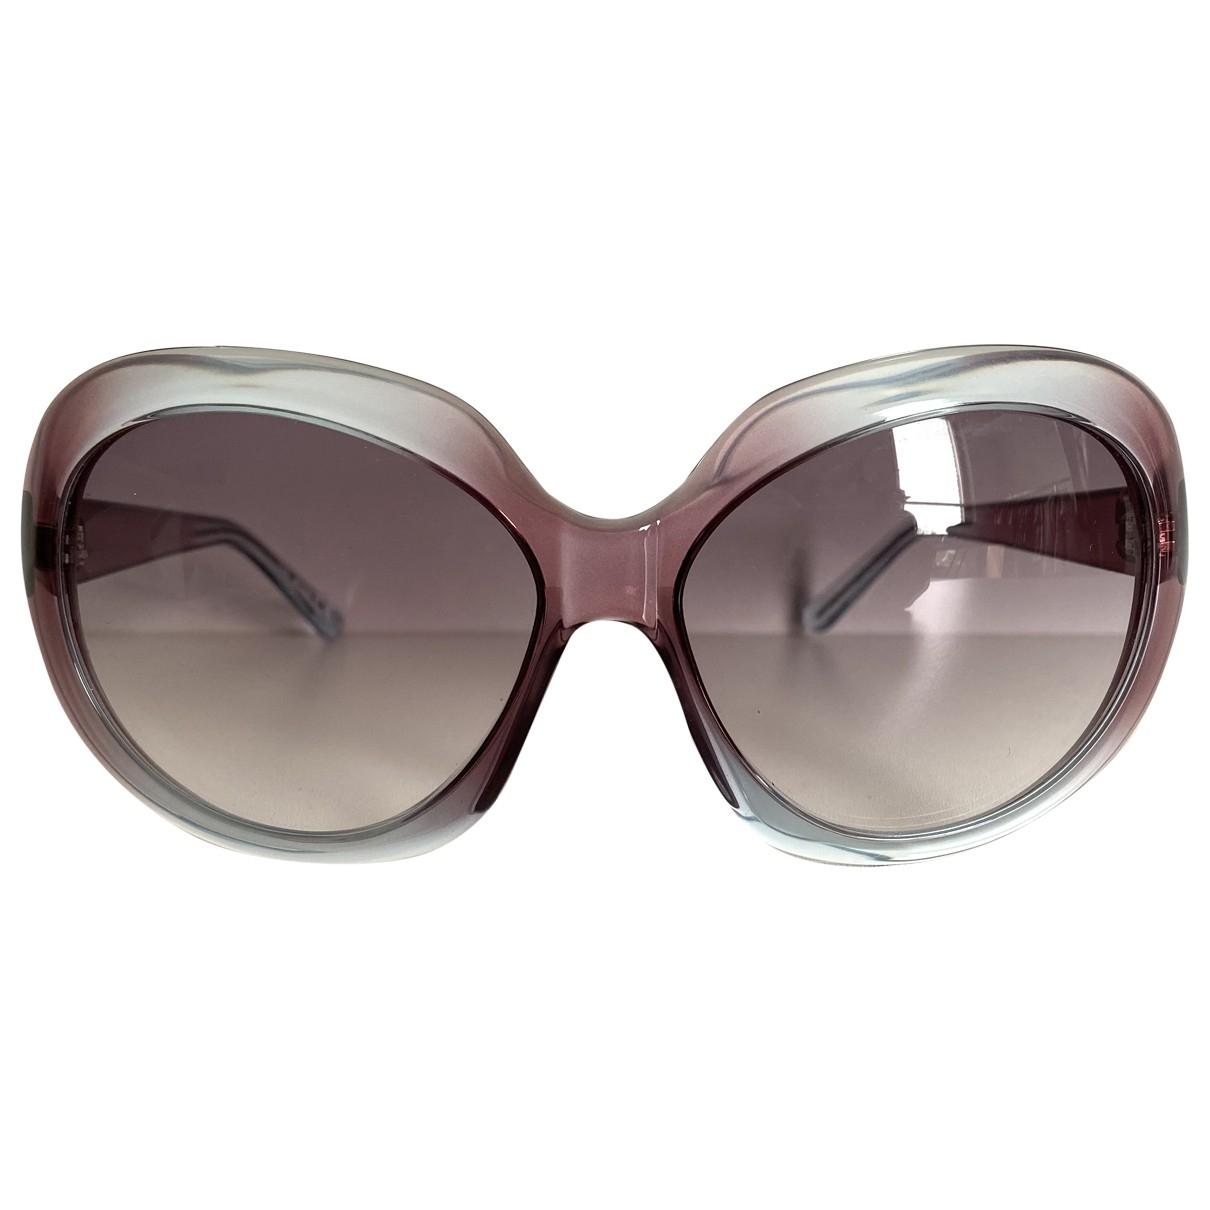 Just Cavalli \N Sonnenbrillen in  Lila Kunststoff